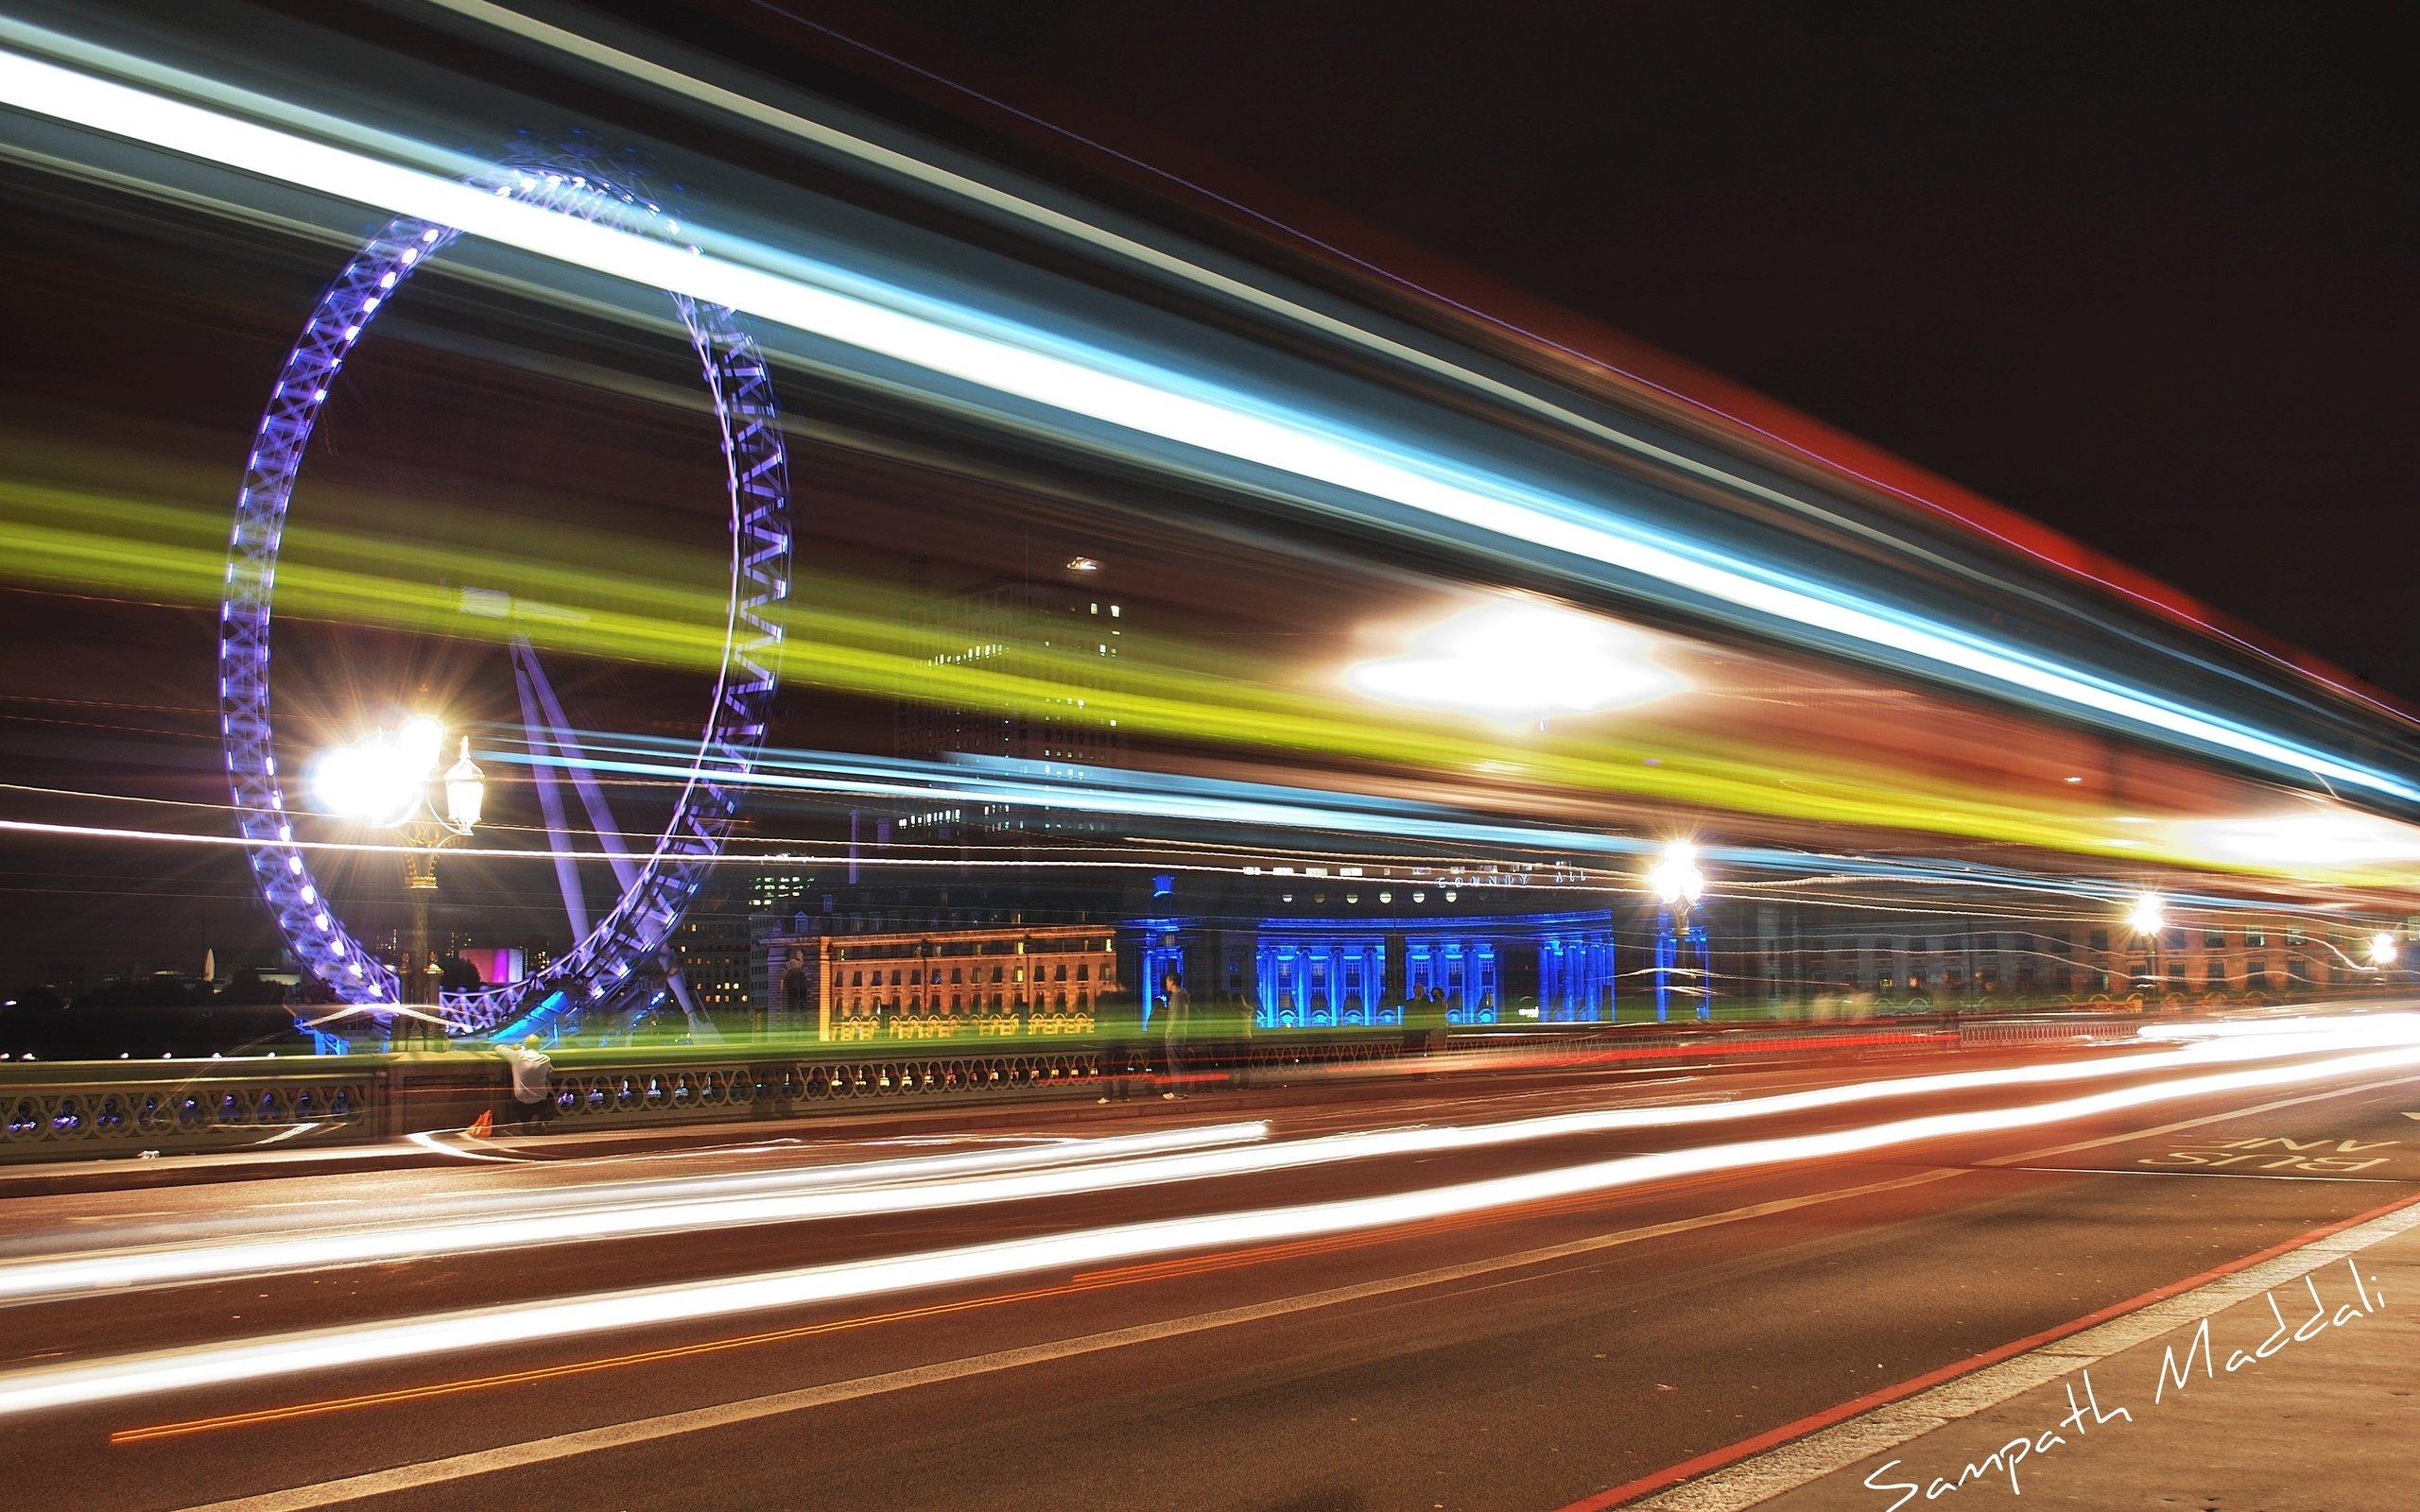 London Wallpaper Hd 1920x1080 Motion Blur Wallpaper 2560x1600 75682